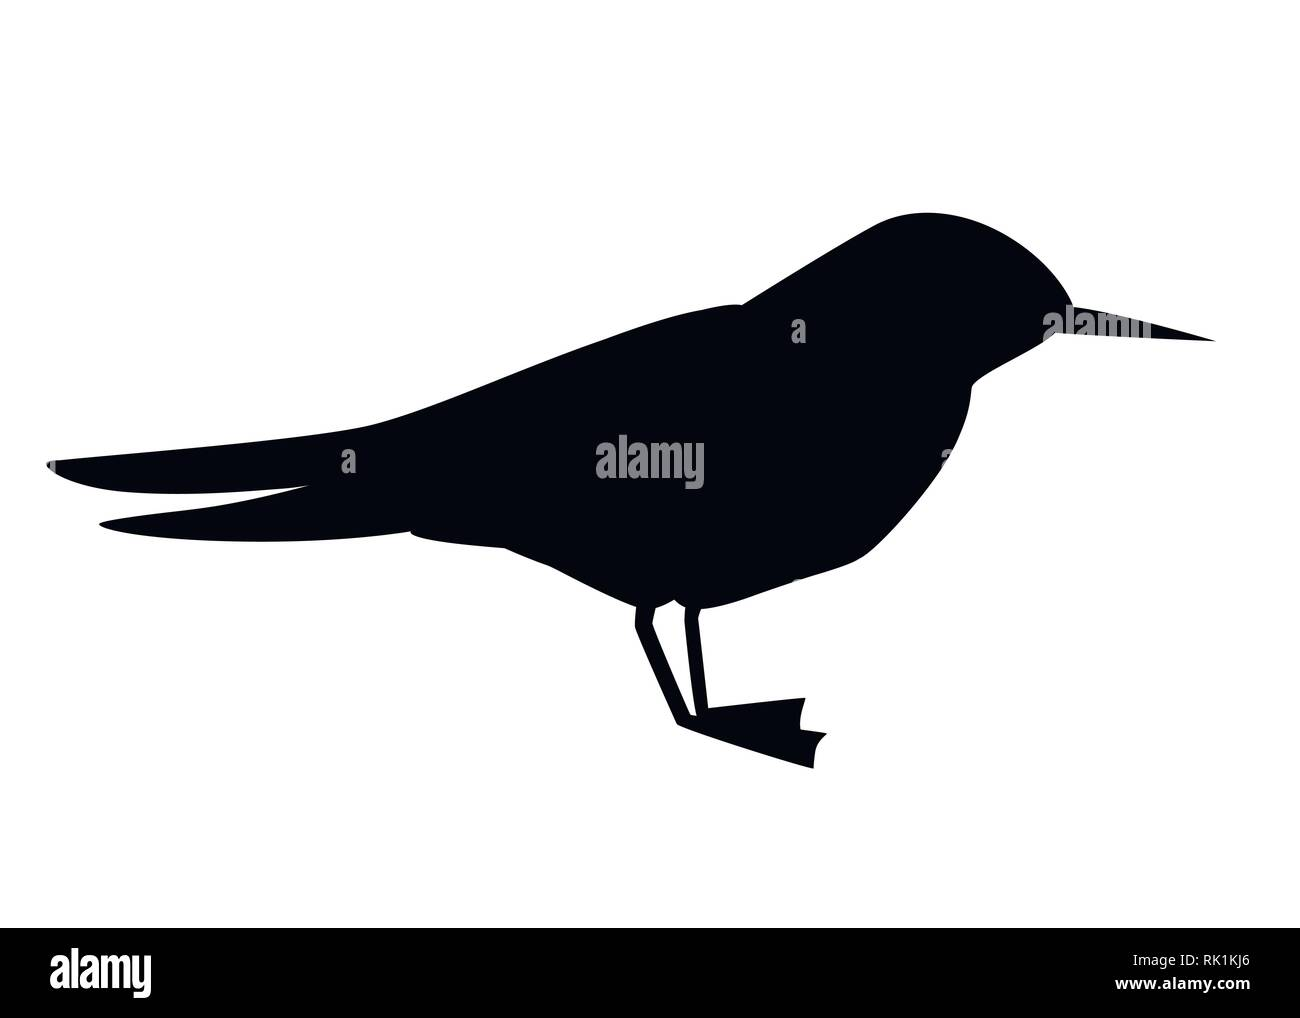 Black silhouette. Flying white bird. Arctic Tern. Sterna hirundo. Arctic animal, cartoon flat design. Vector illustration isolated on white background - Stock Vector